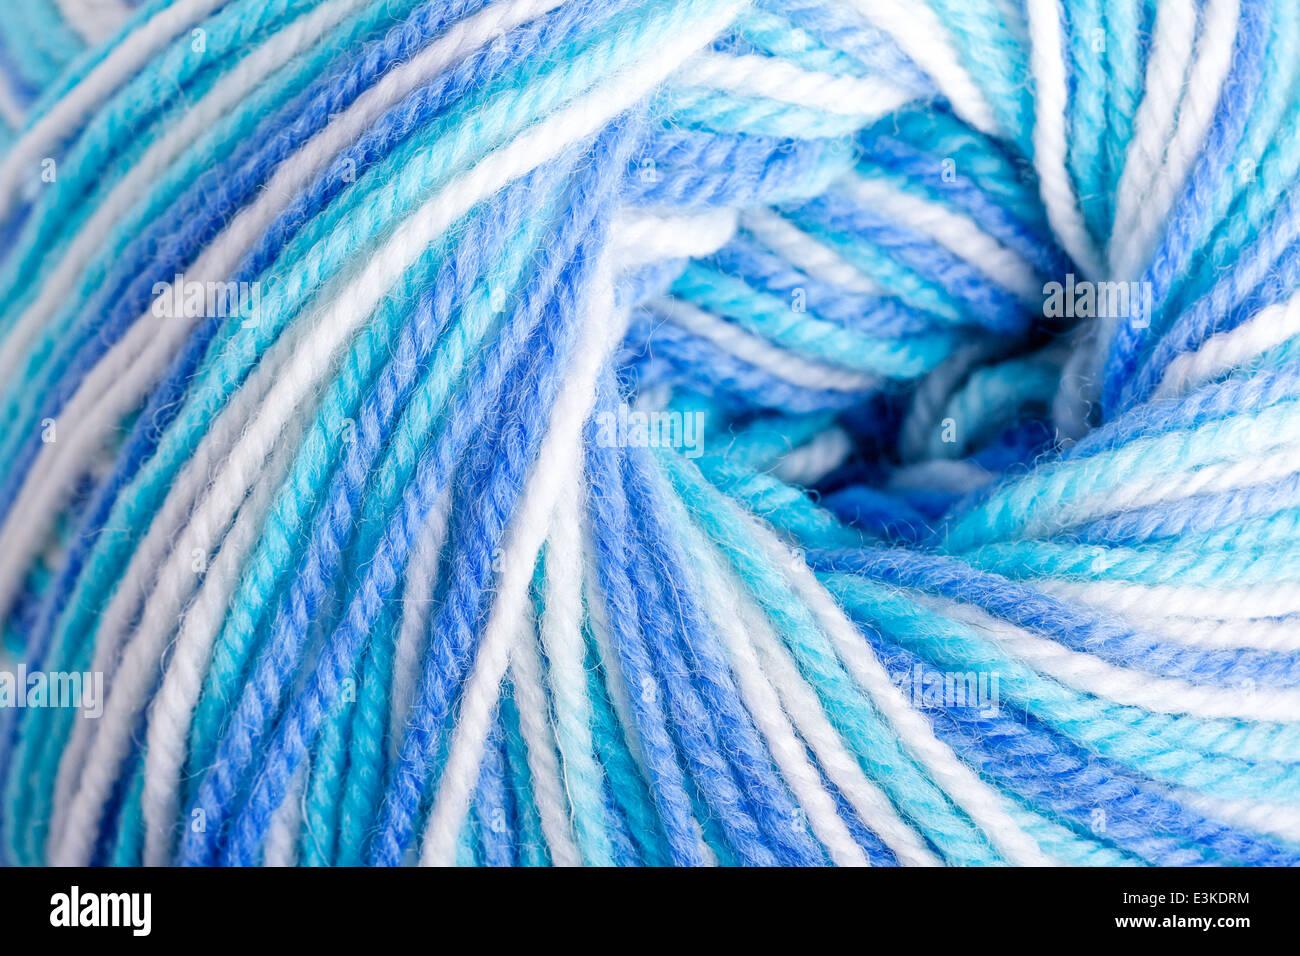 Varicolored balloon of soft yarn - Stock Image